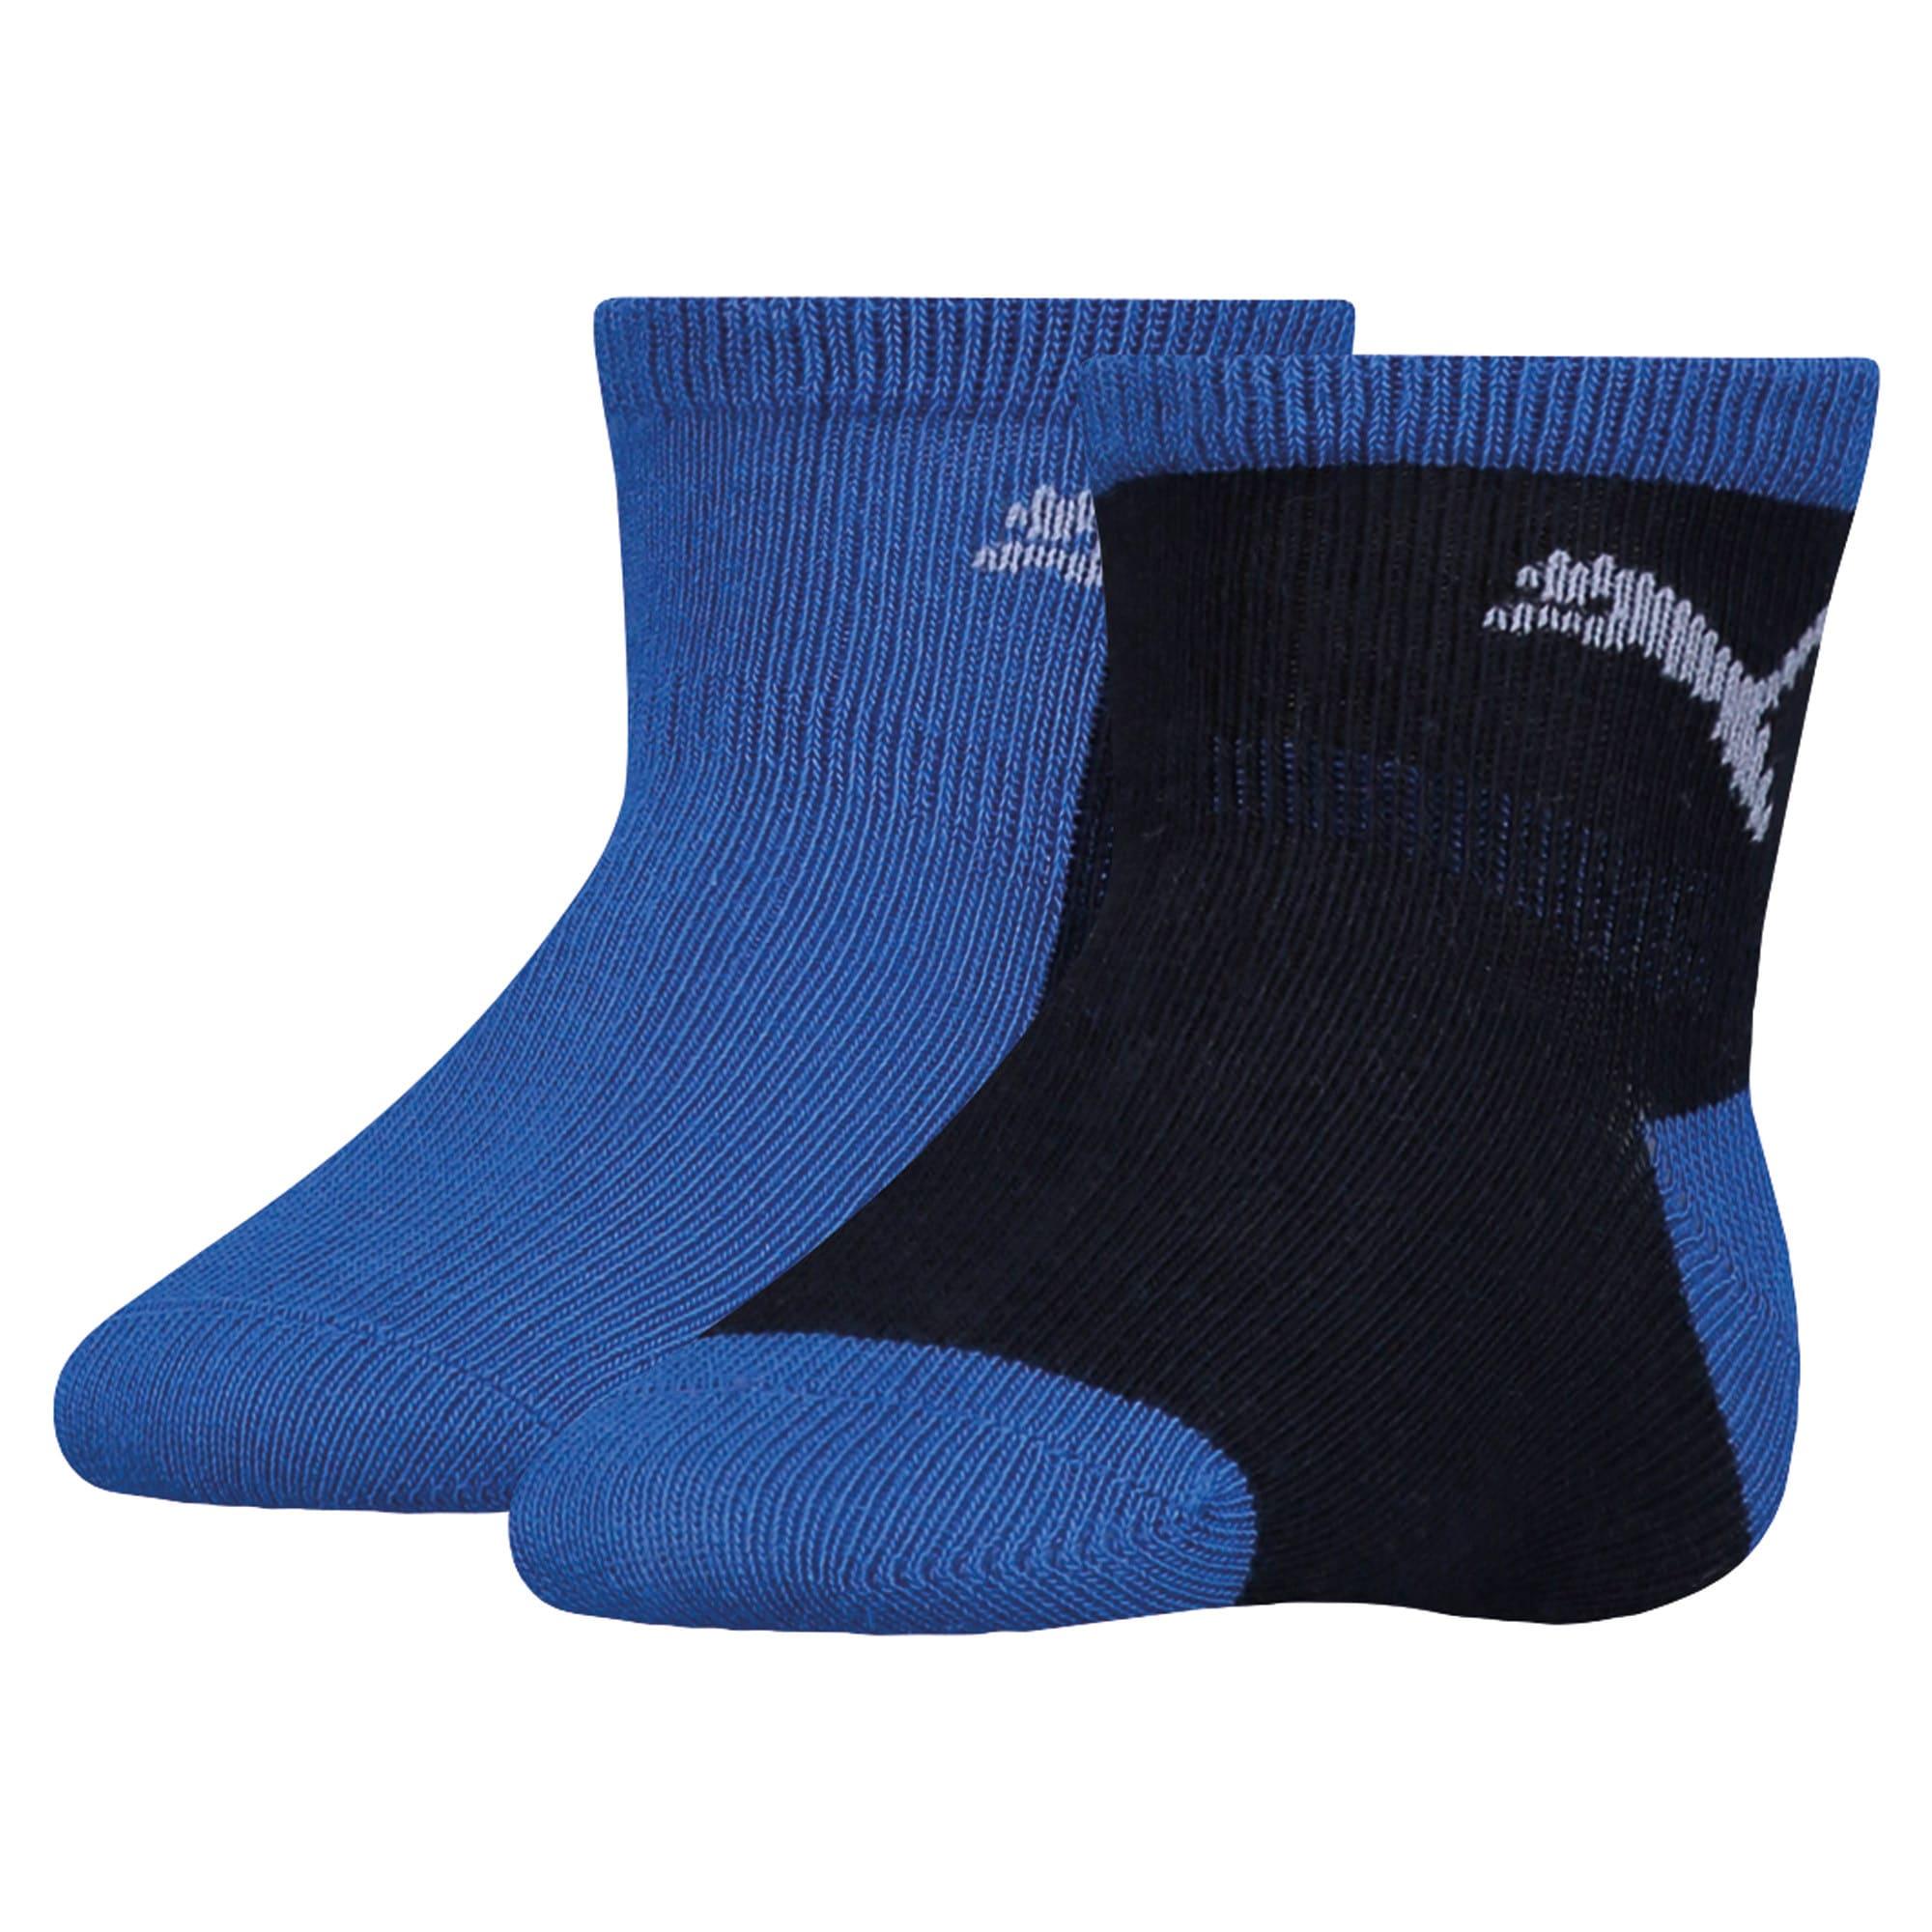 Thumbnail 1 of Mini Cats Anti-Slip Babies' Socks 2 Pack, powder blue, medium